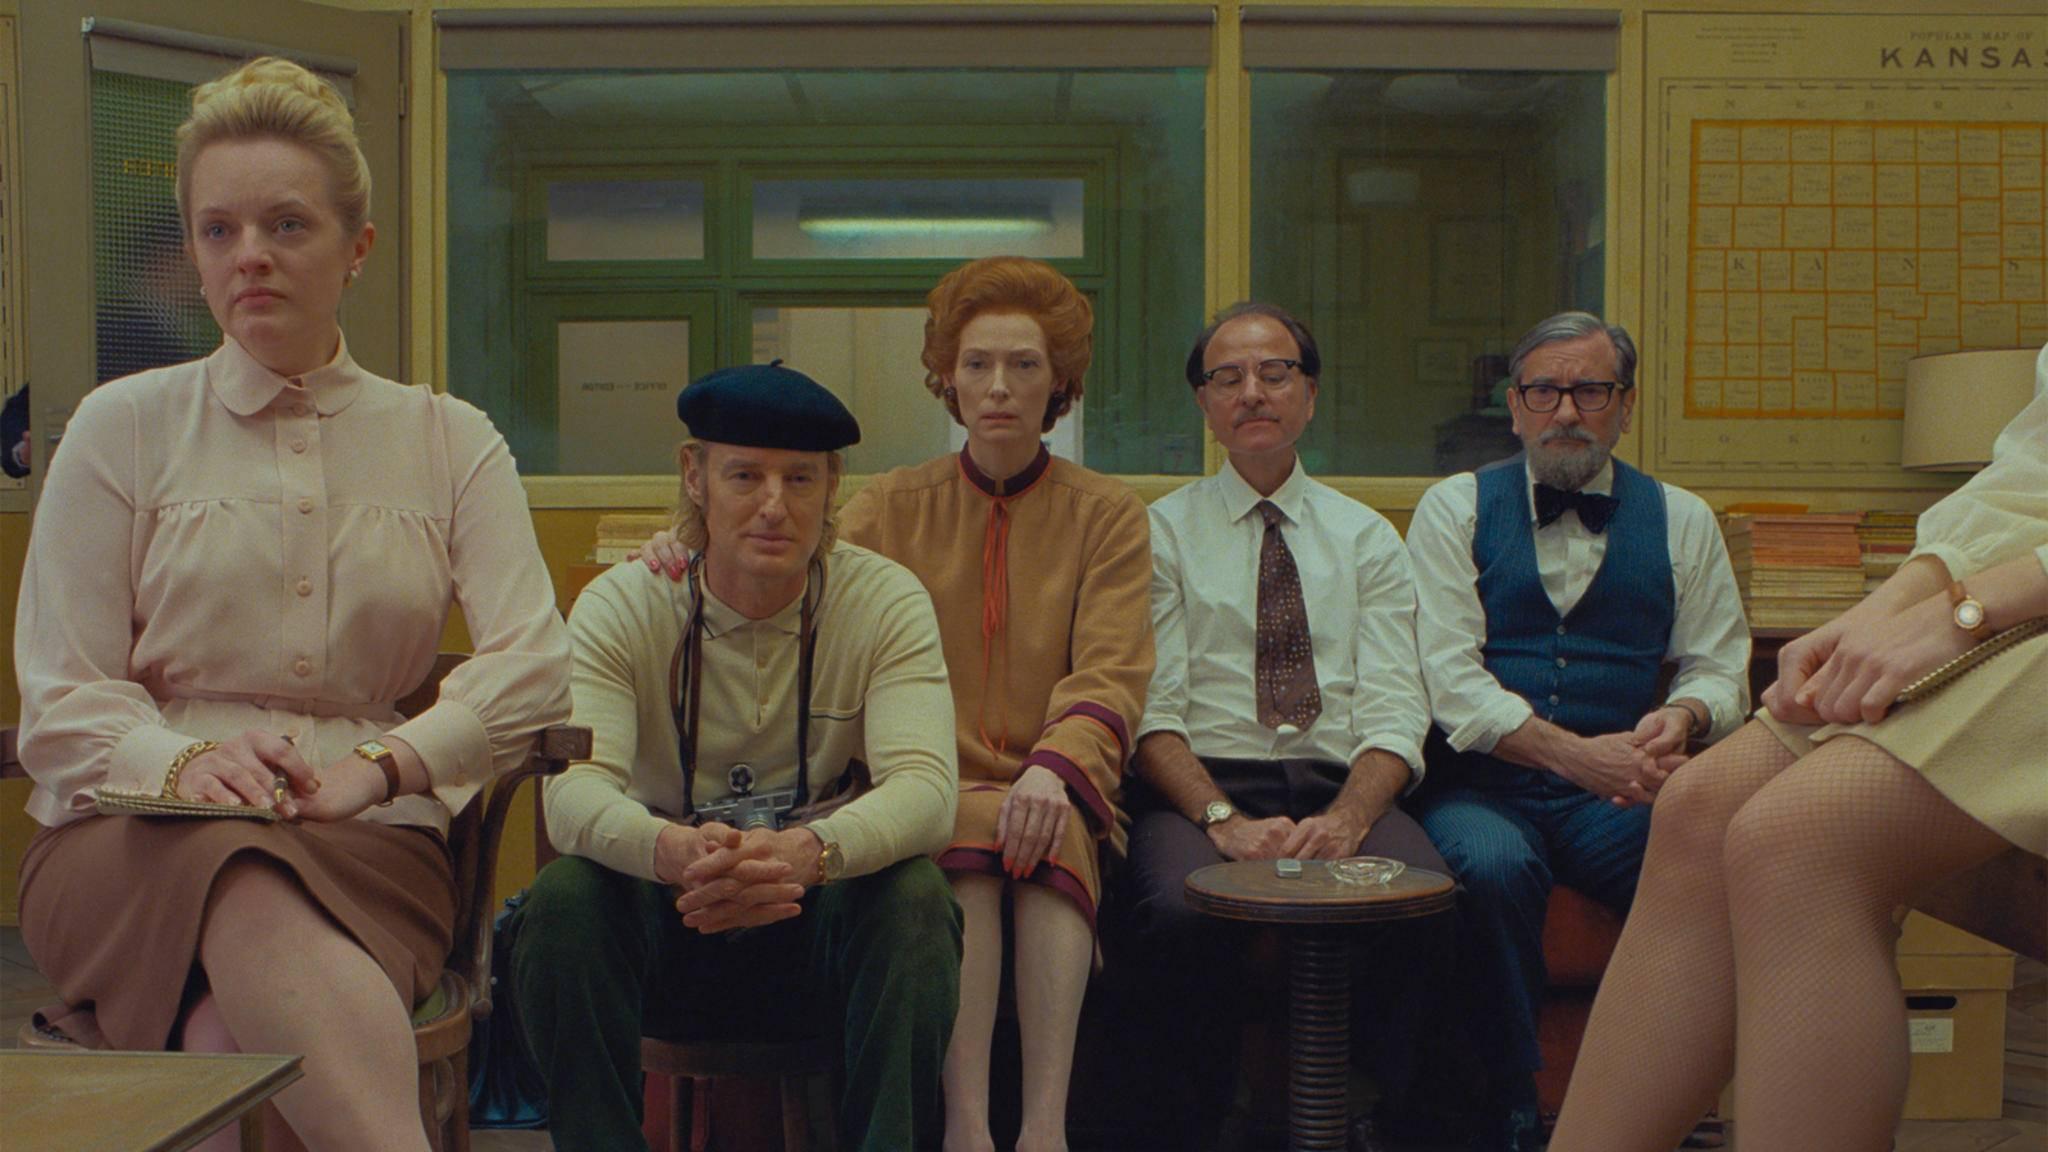 the french dispatch Elisabeth Moss, Owen Wilson, Tilda Swinton, Fisher Stevens, Griffin Dunne